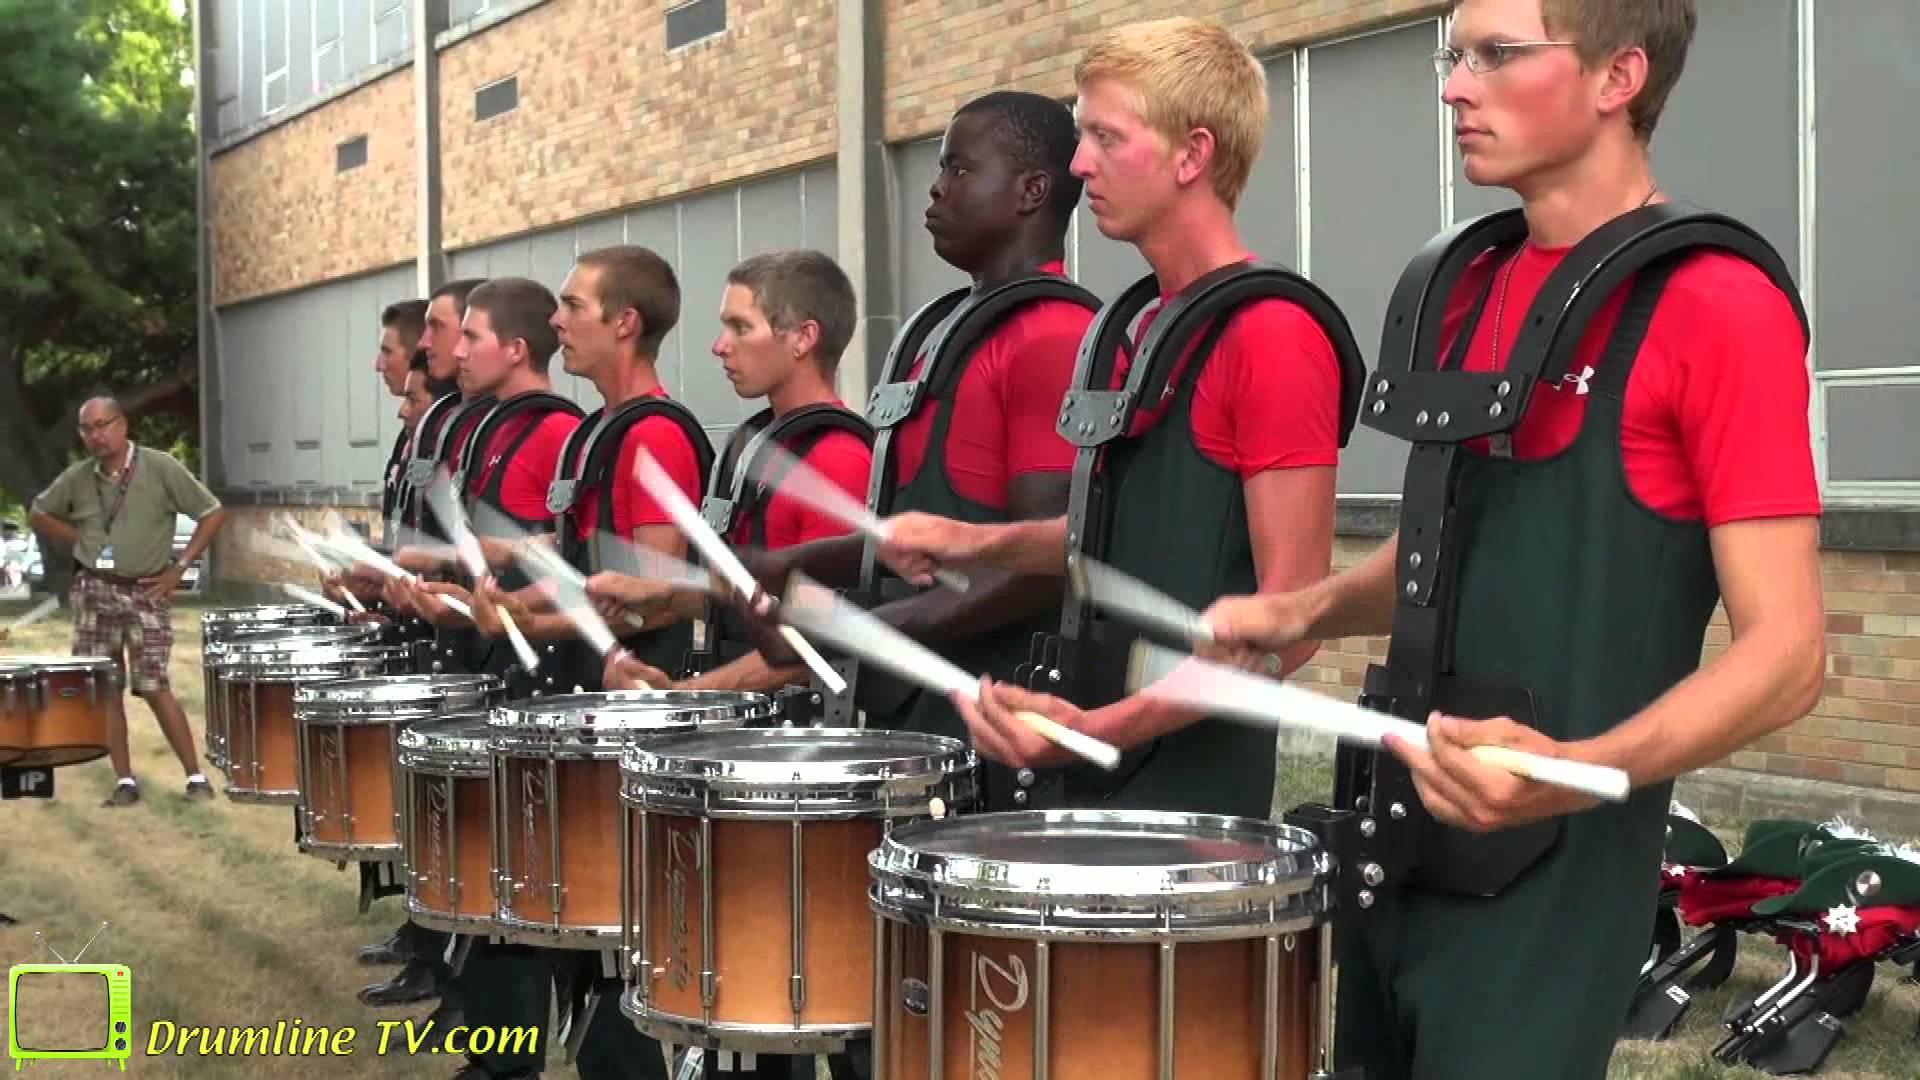 Santa Clara Vanguard 2012 Drumline – Show of Shows – Rockford, Illinois 7-15-12